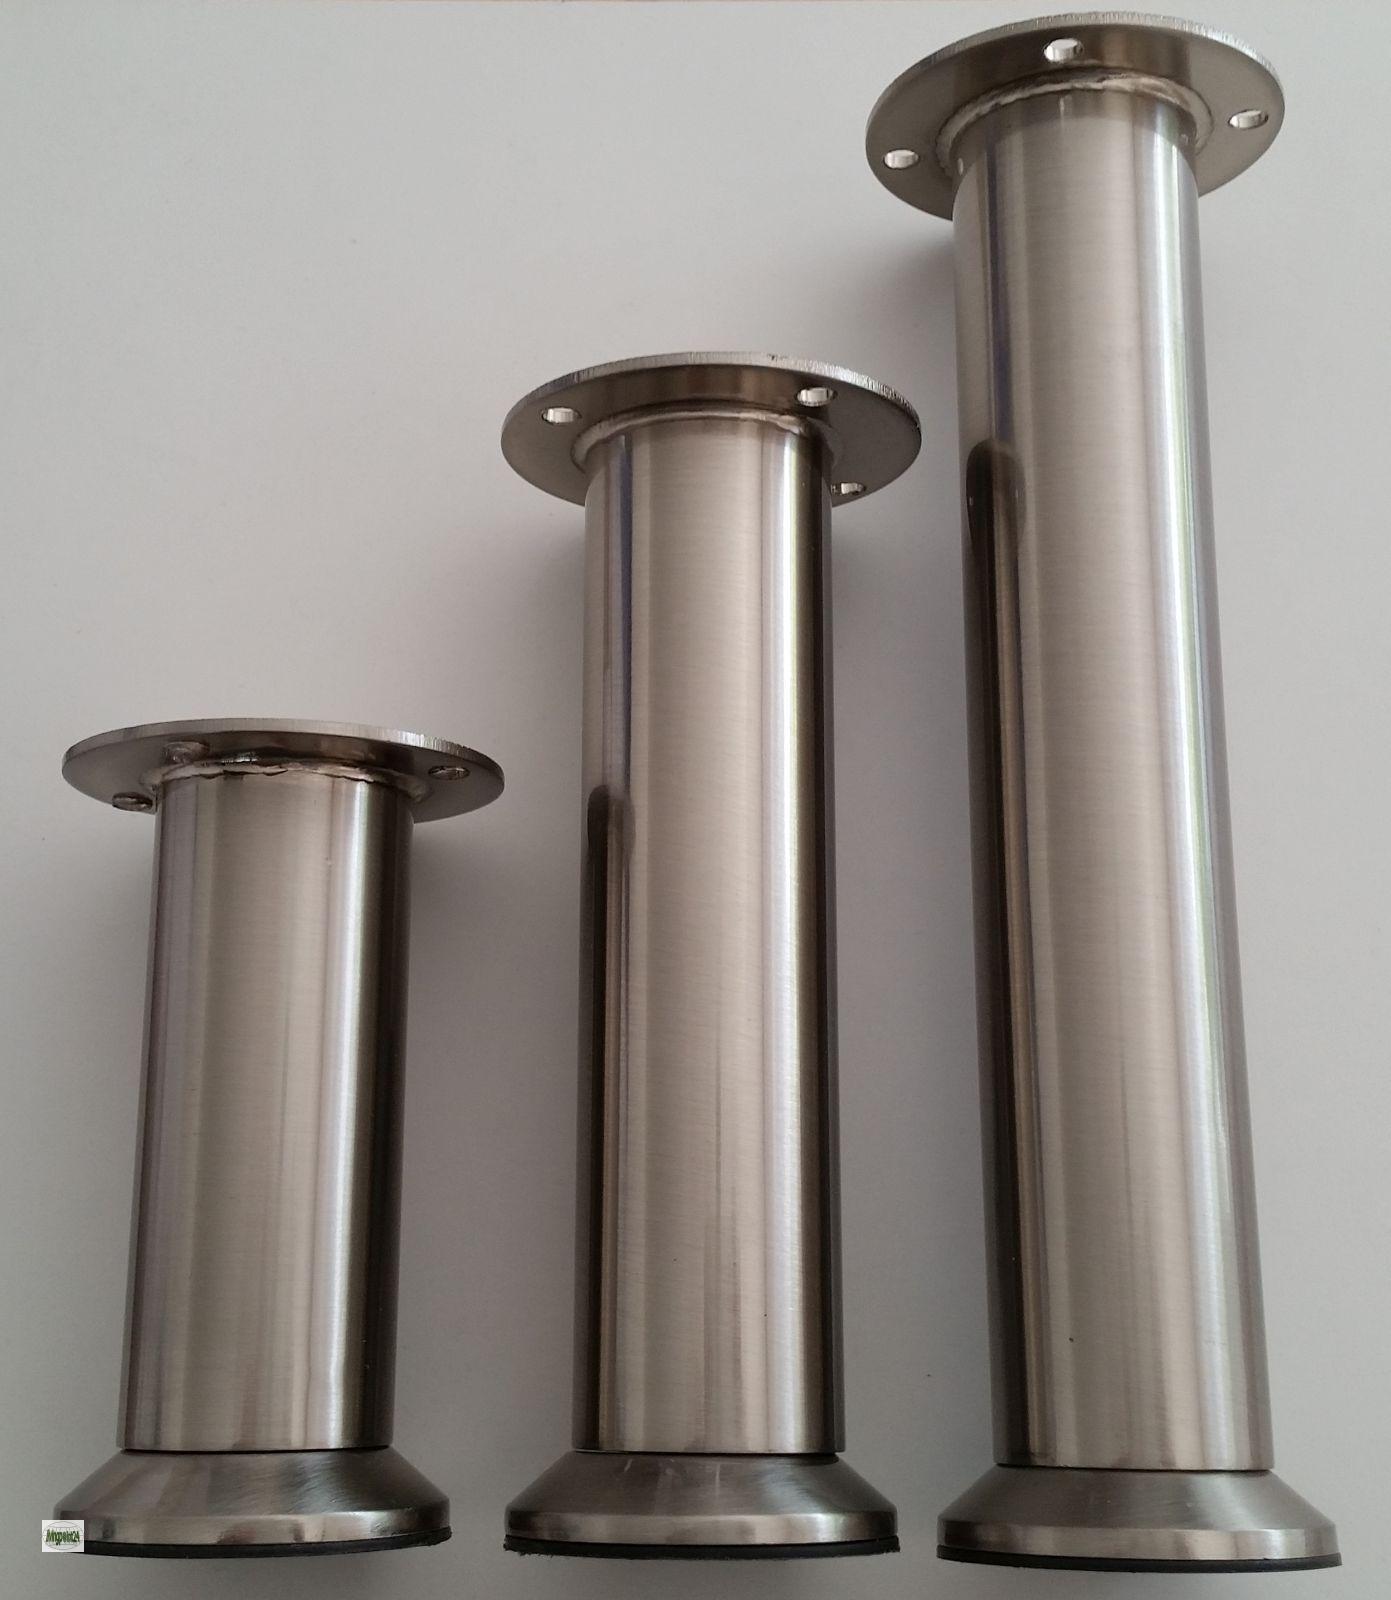 Idee design mülleimer küche : Supporto piede Ø altezza 35 millimetri mobili regolabili gamba 150 mm ...